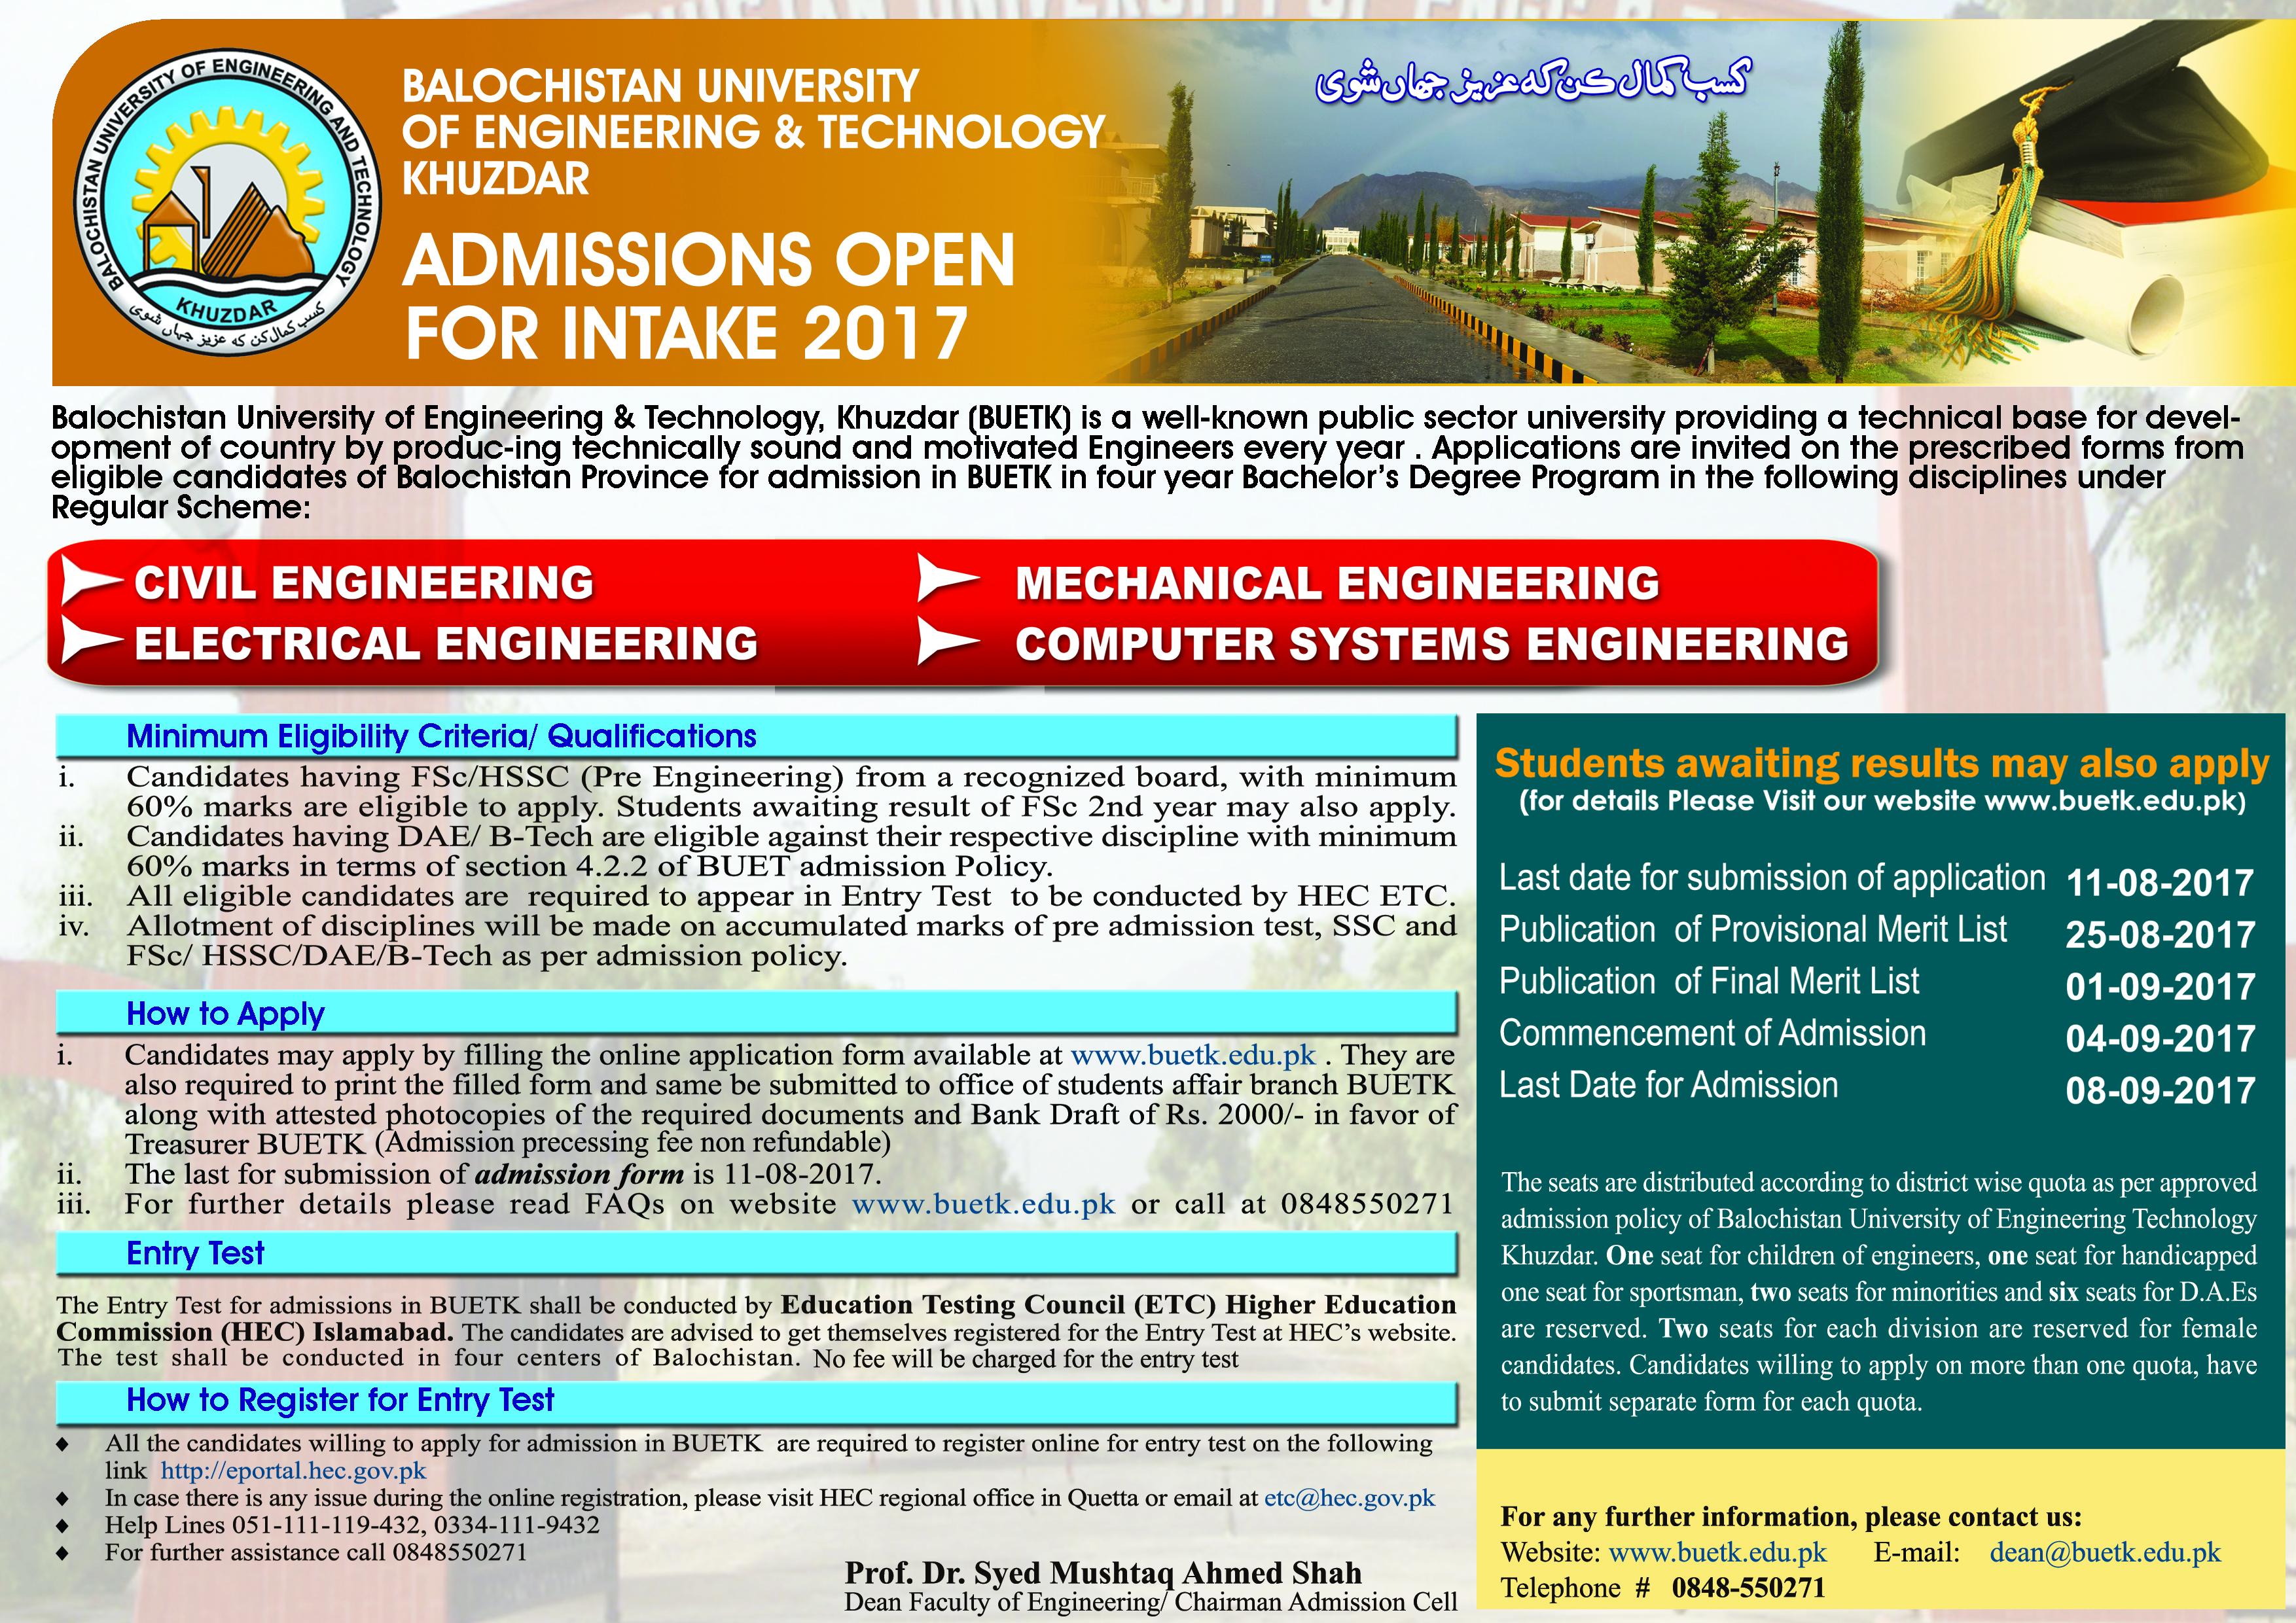 Balochistan University of Engineering BUET Khuzdar Admissions 2017